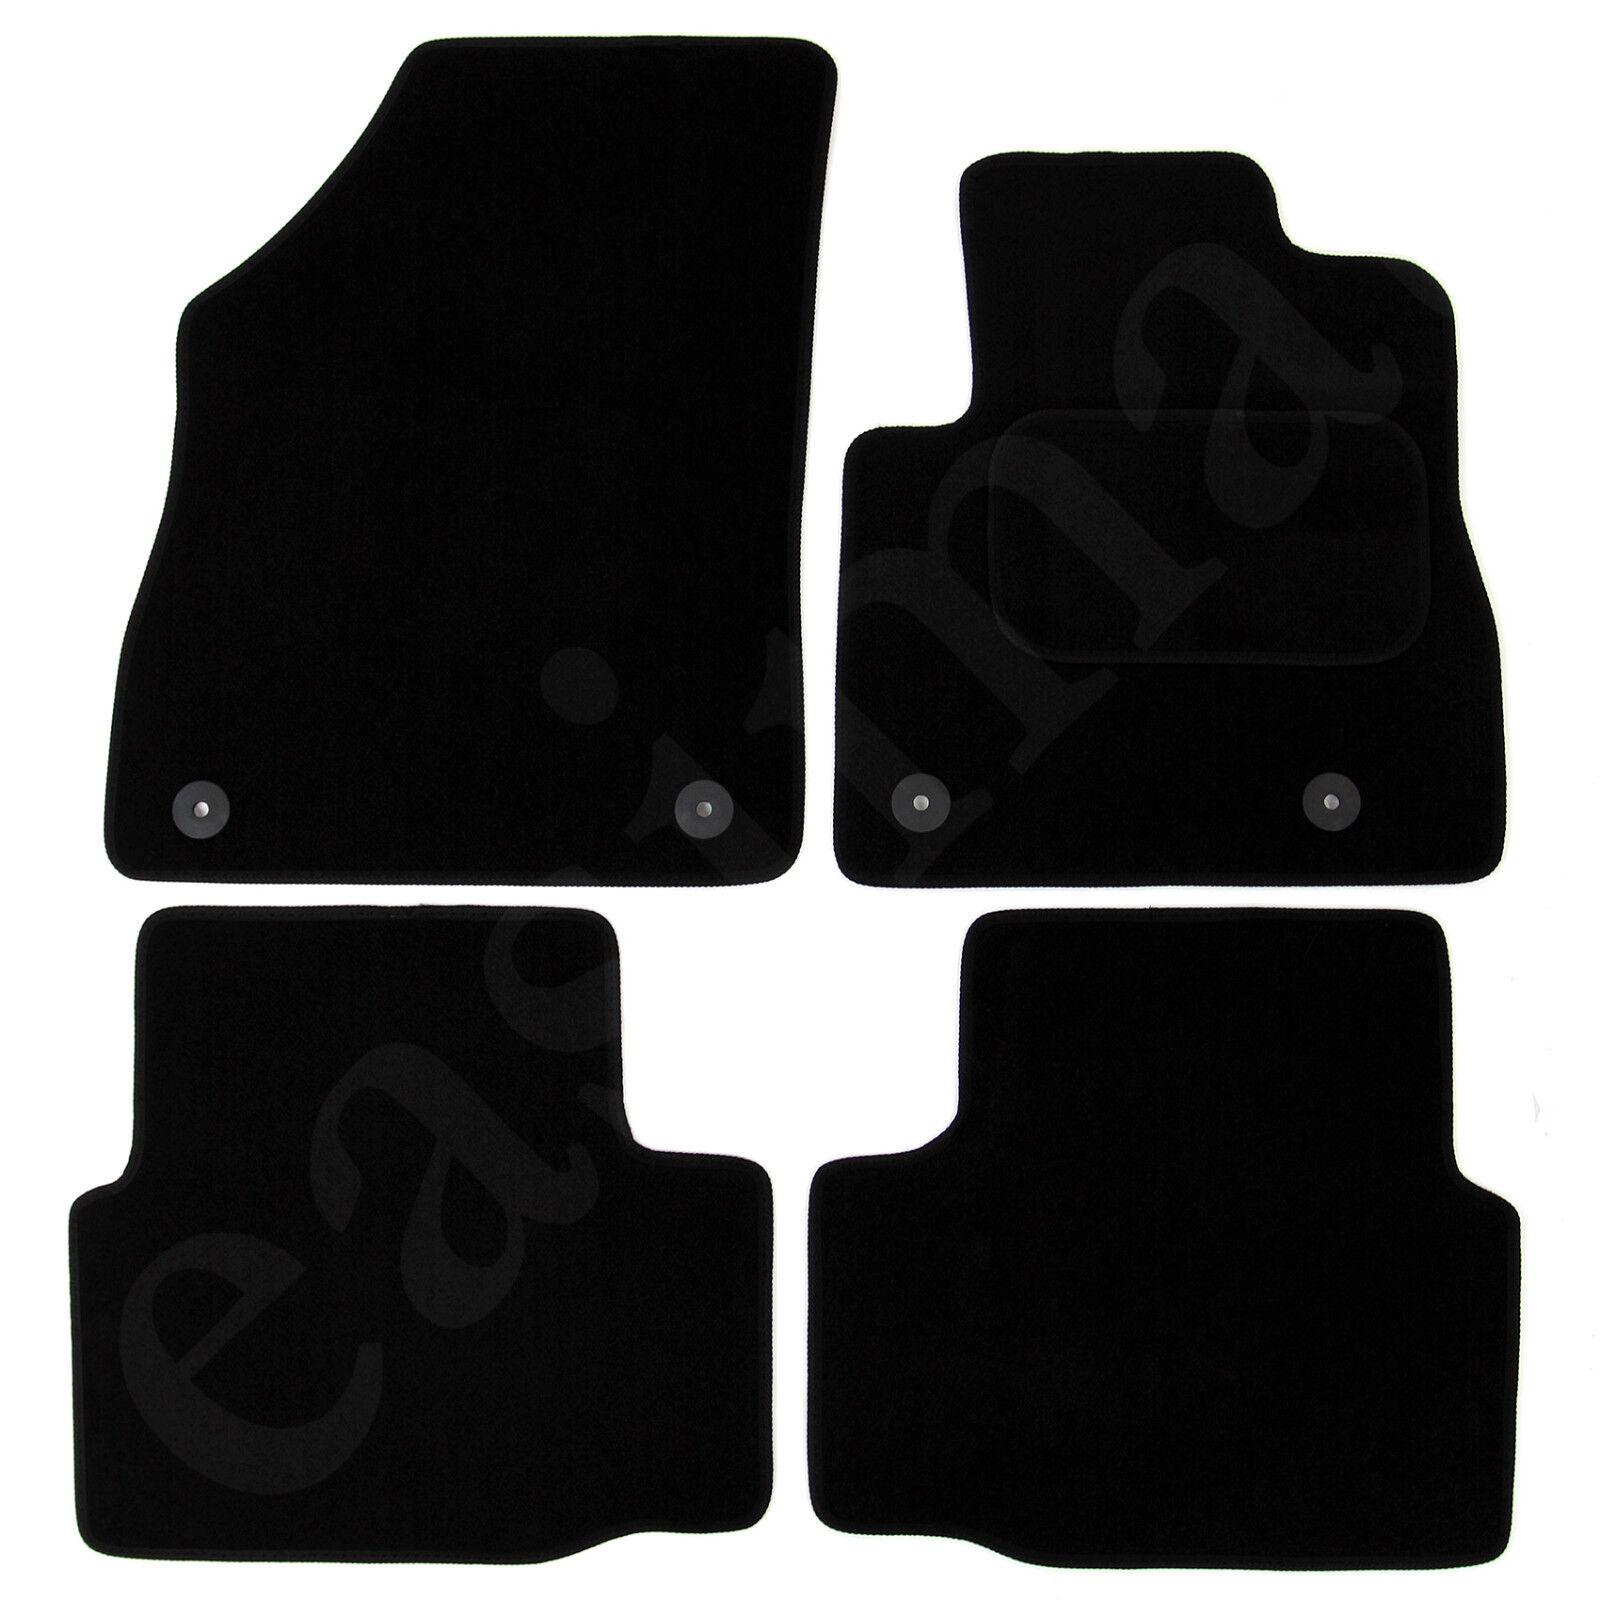 Car Parts - Vauxhall Astra K Mk7 2015 onwards Tailored Carpet Car Mats Black 4pc Floor Set